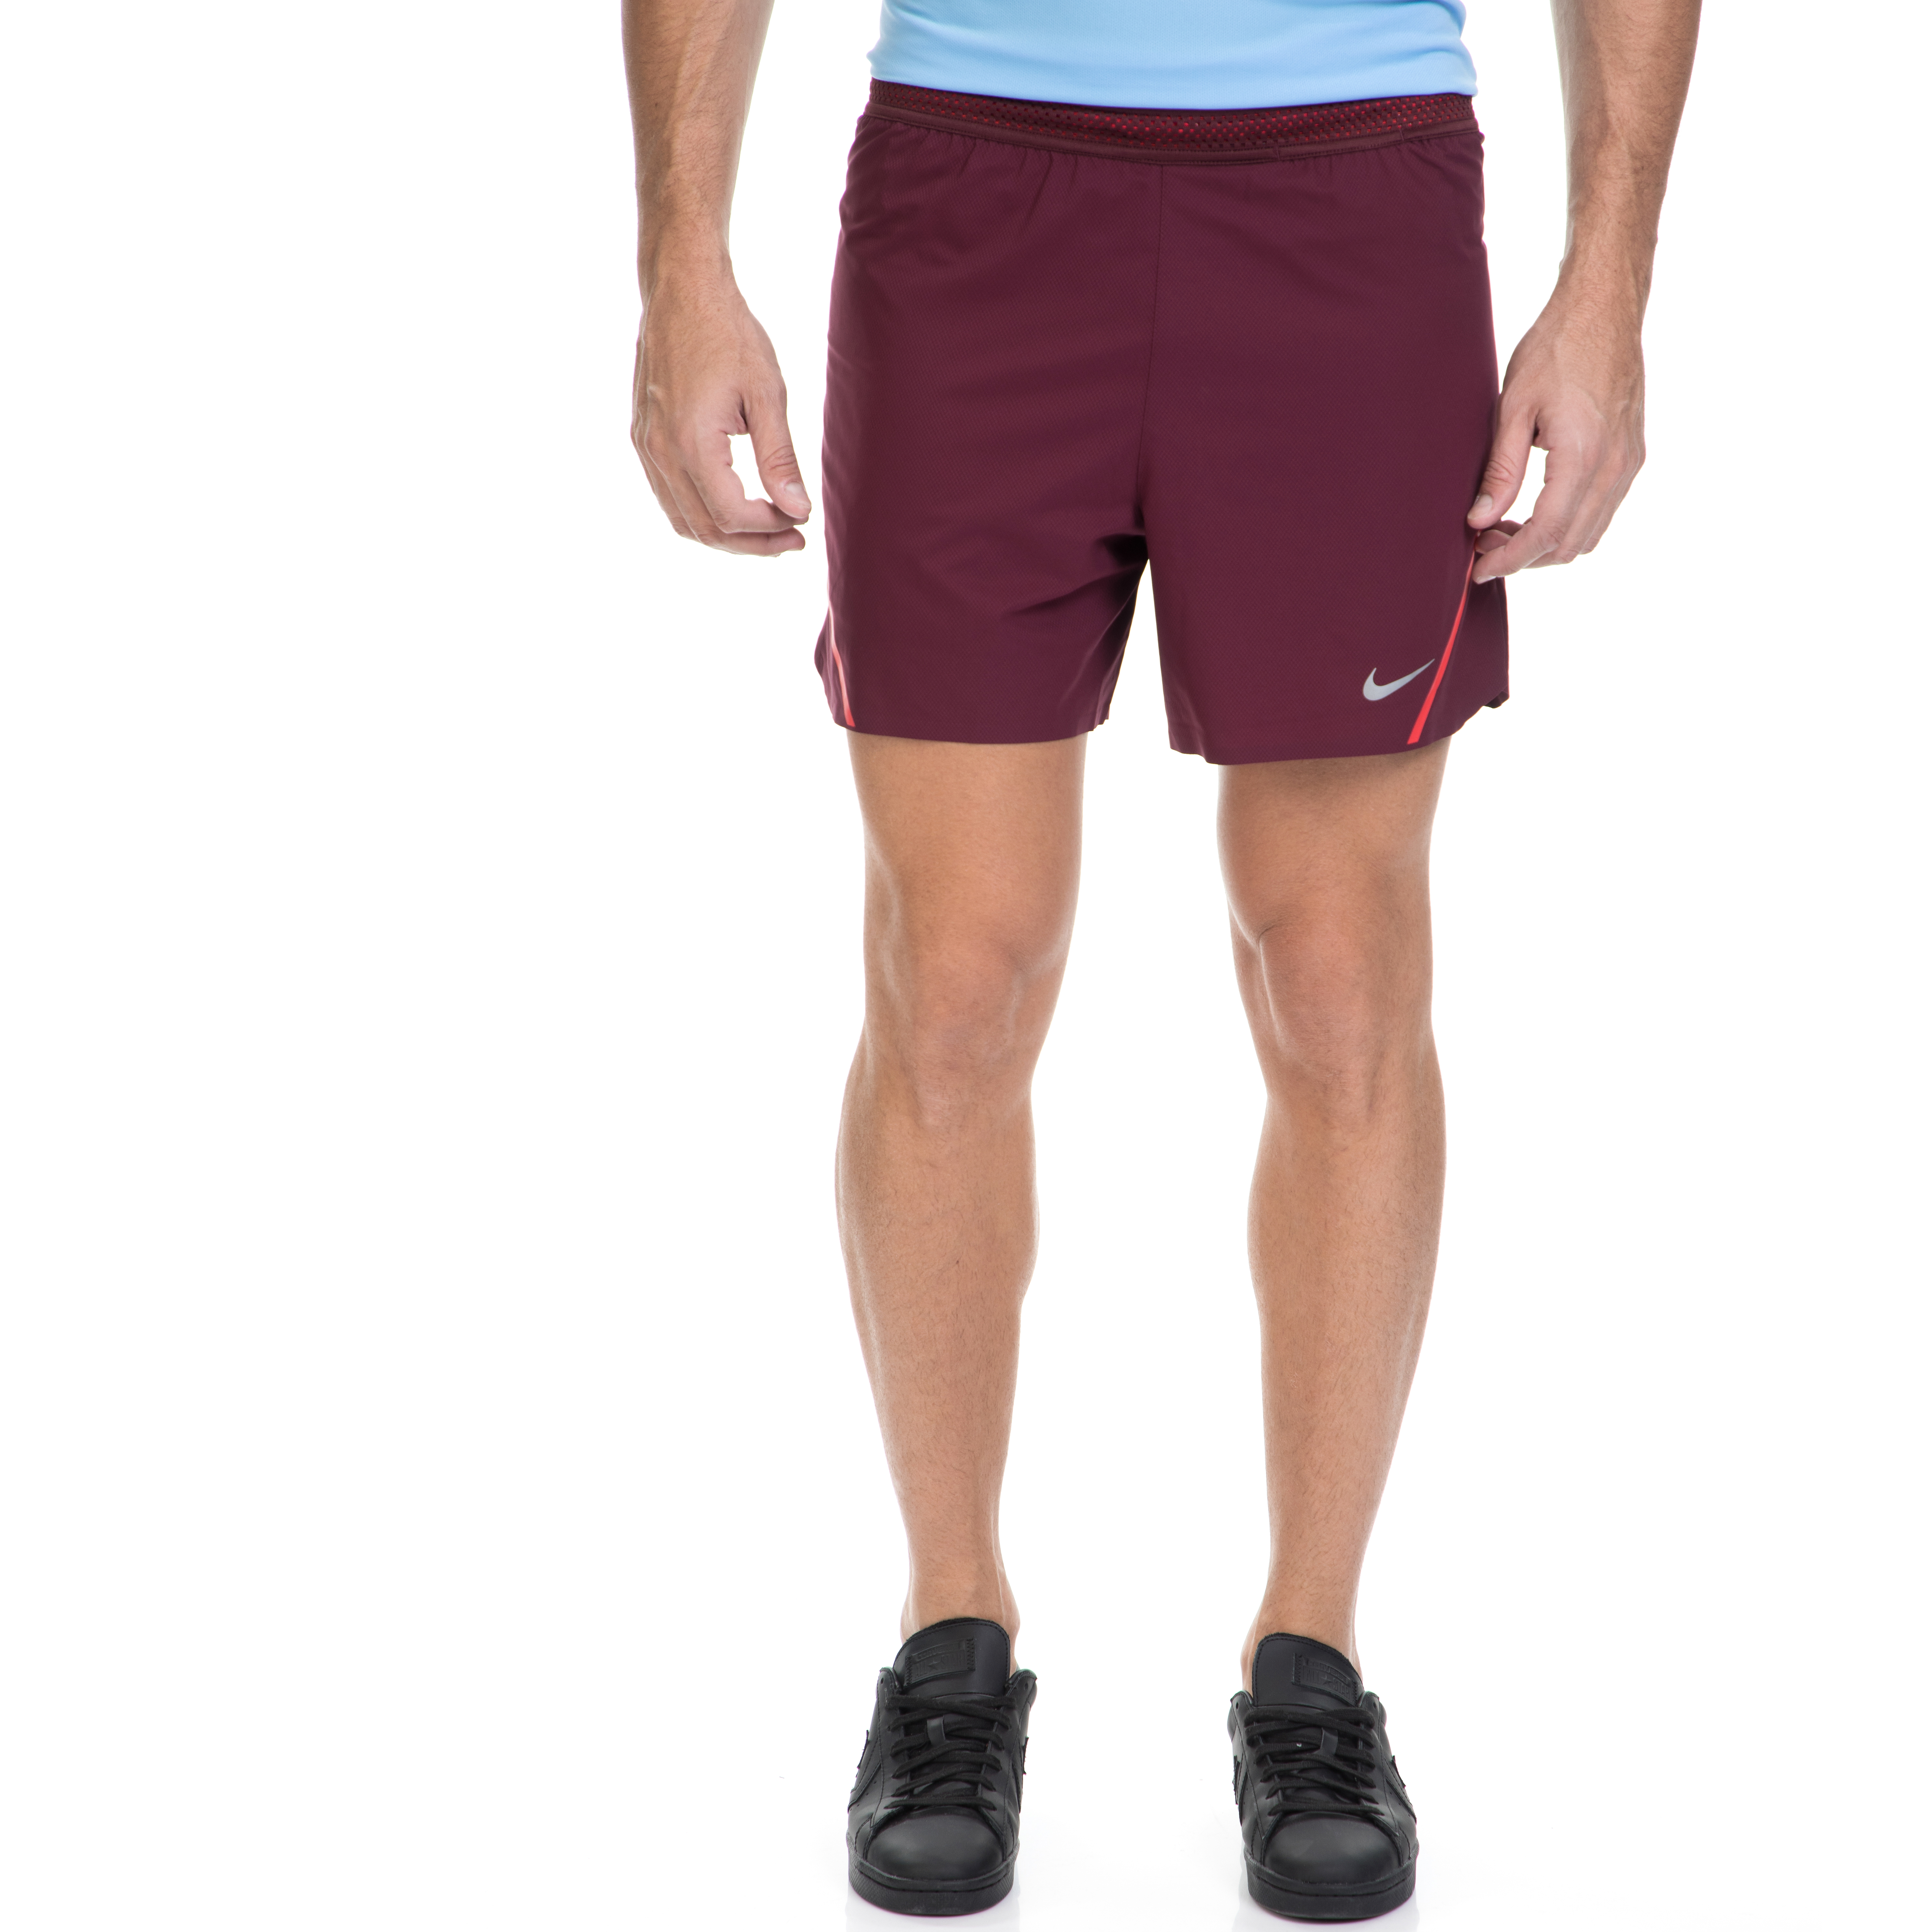 NIKE - Ανδρικό αθλητικό σορτς ΝΙΚΕ AEROSWIFT SHORT 5IN μπορντό ανδρικά ρούχα σορτς βερμούδες αθλητικά